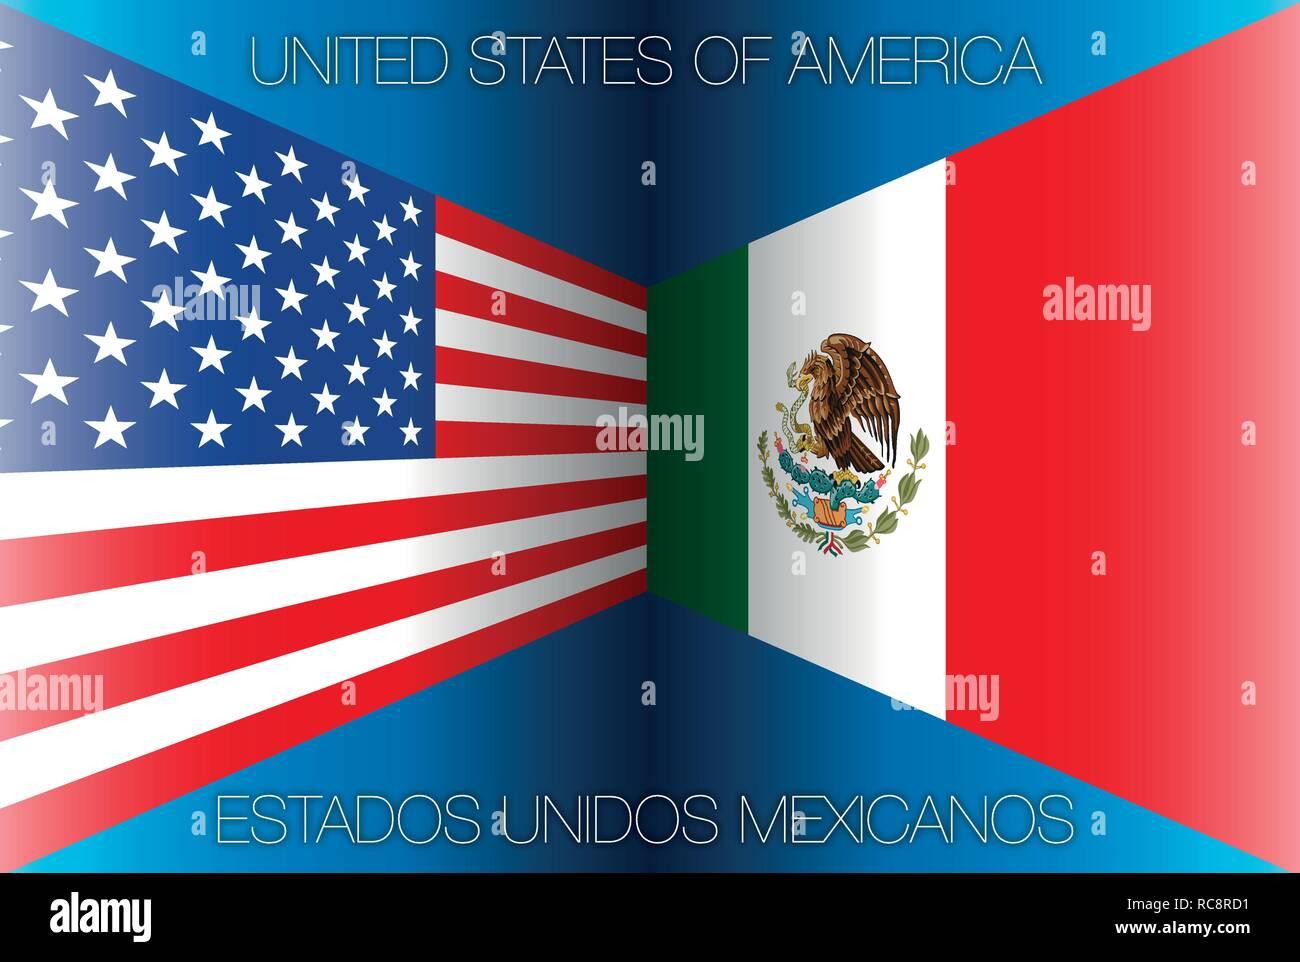 Mexico Vs United States Stock Photos Mexico Vs United States Stock